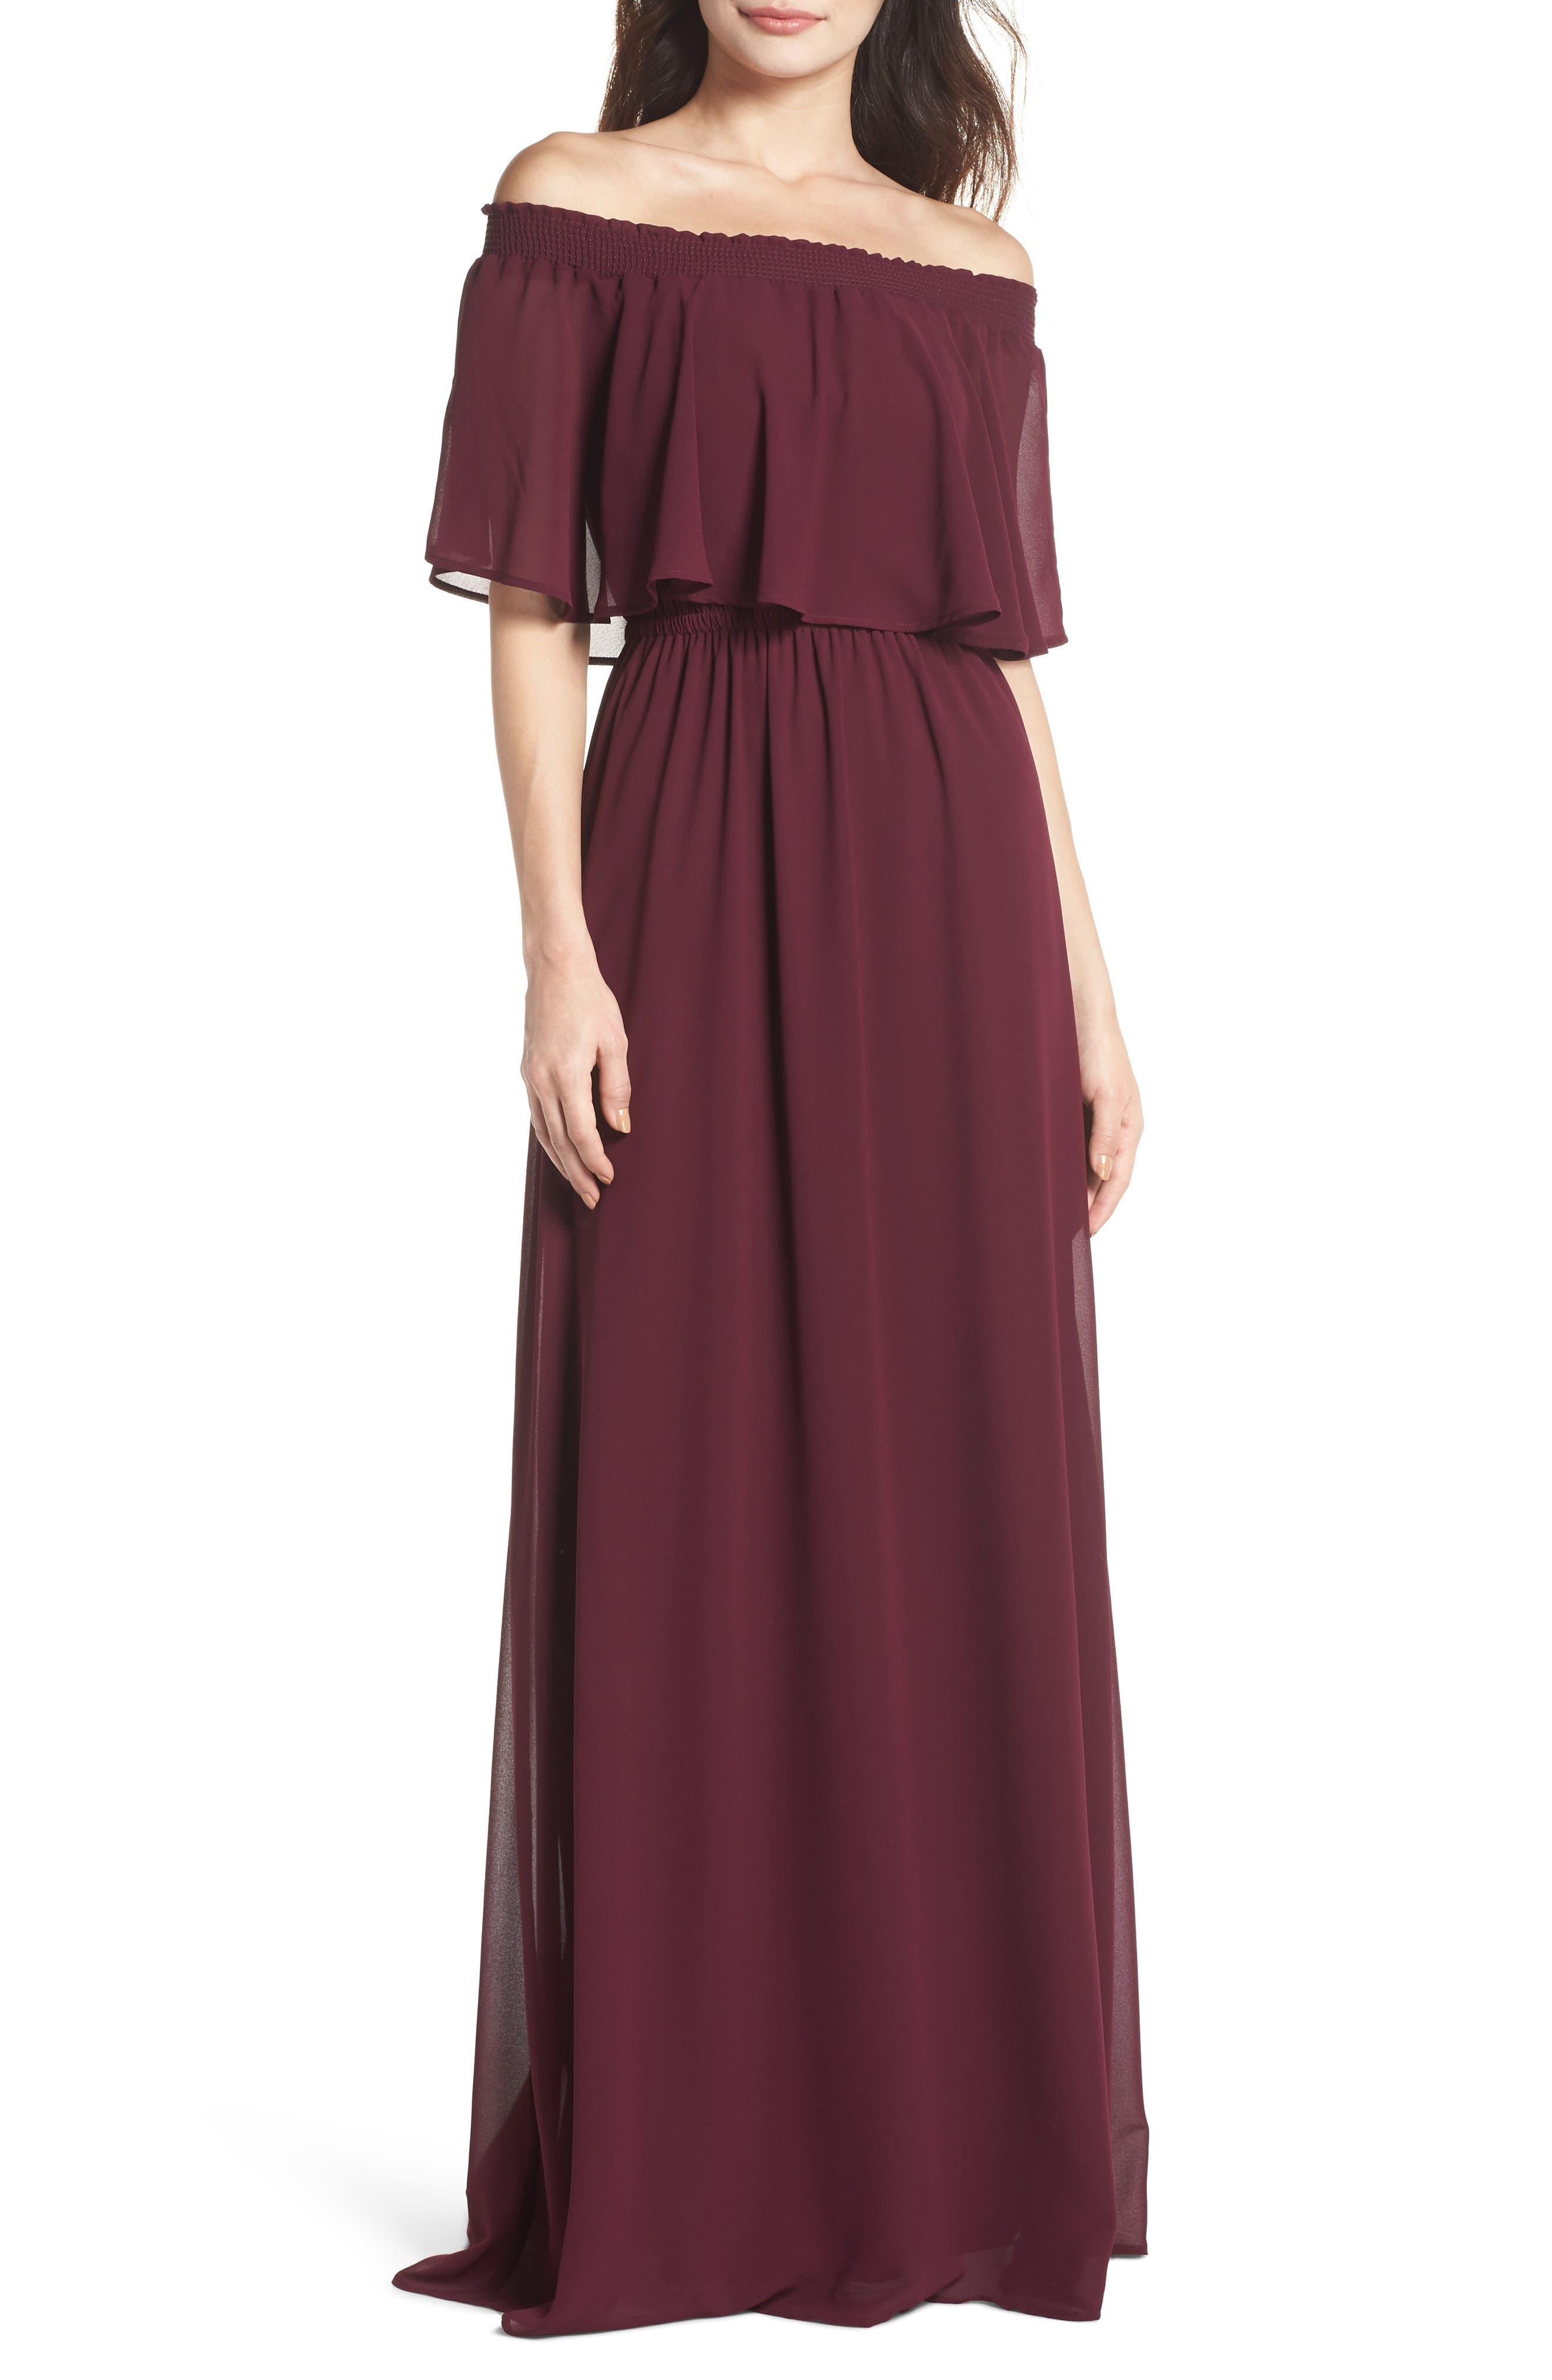 Hacienda Convertible Gown,                             Main thumbnail 1, color,                             MERLOT CHIFFON